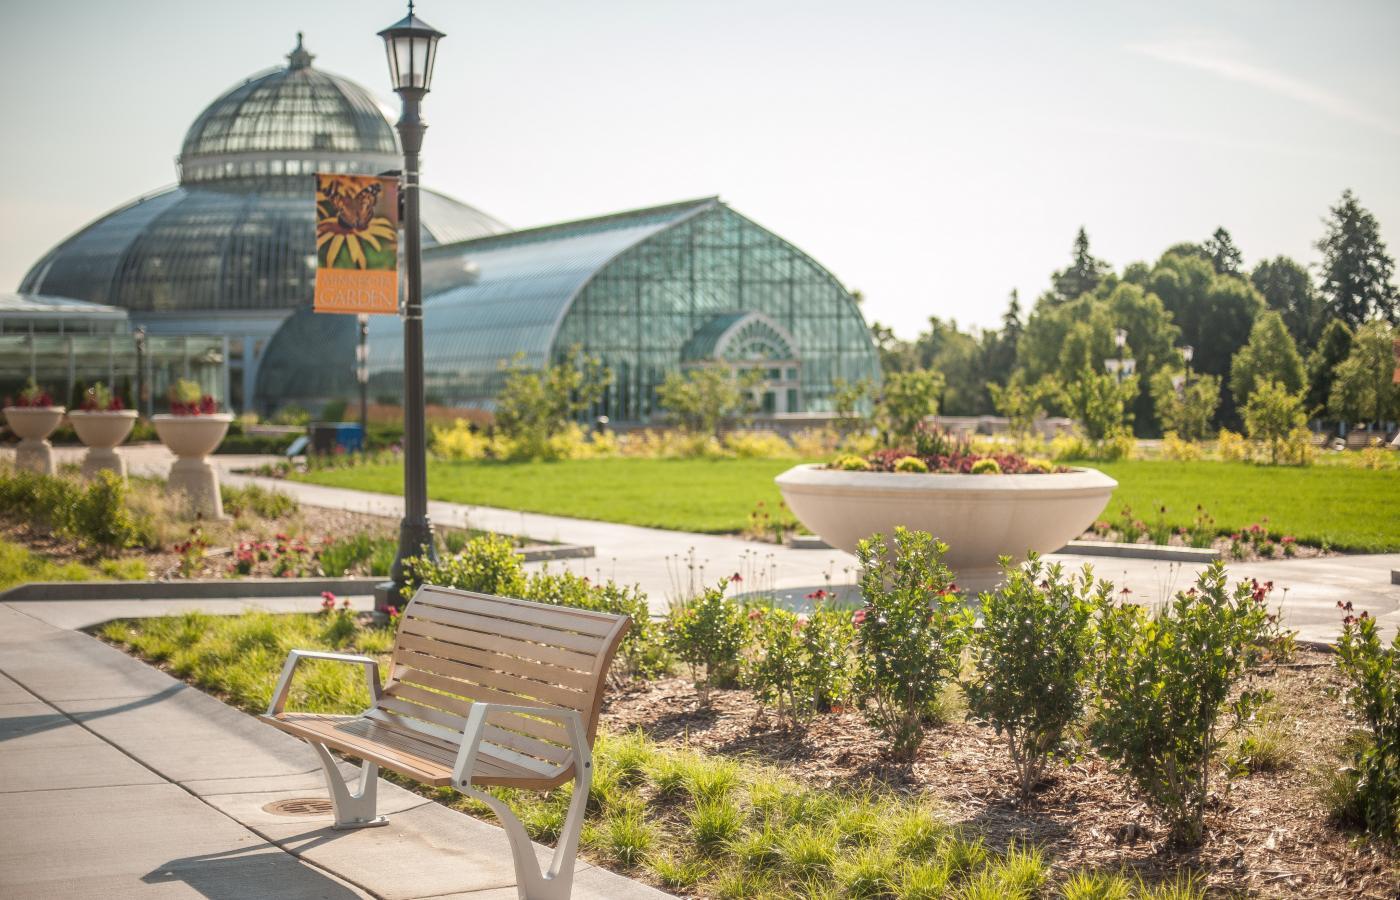 Minnesota Garden at Como Park - 1